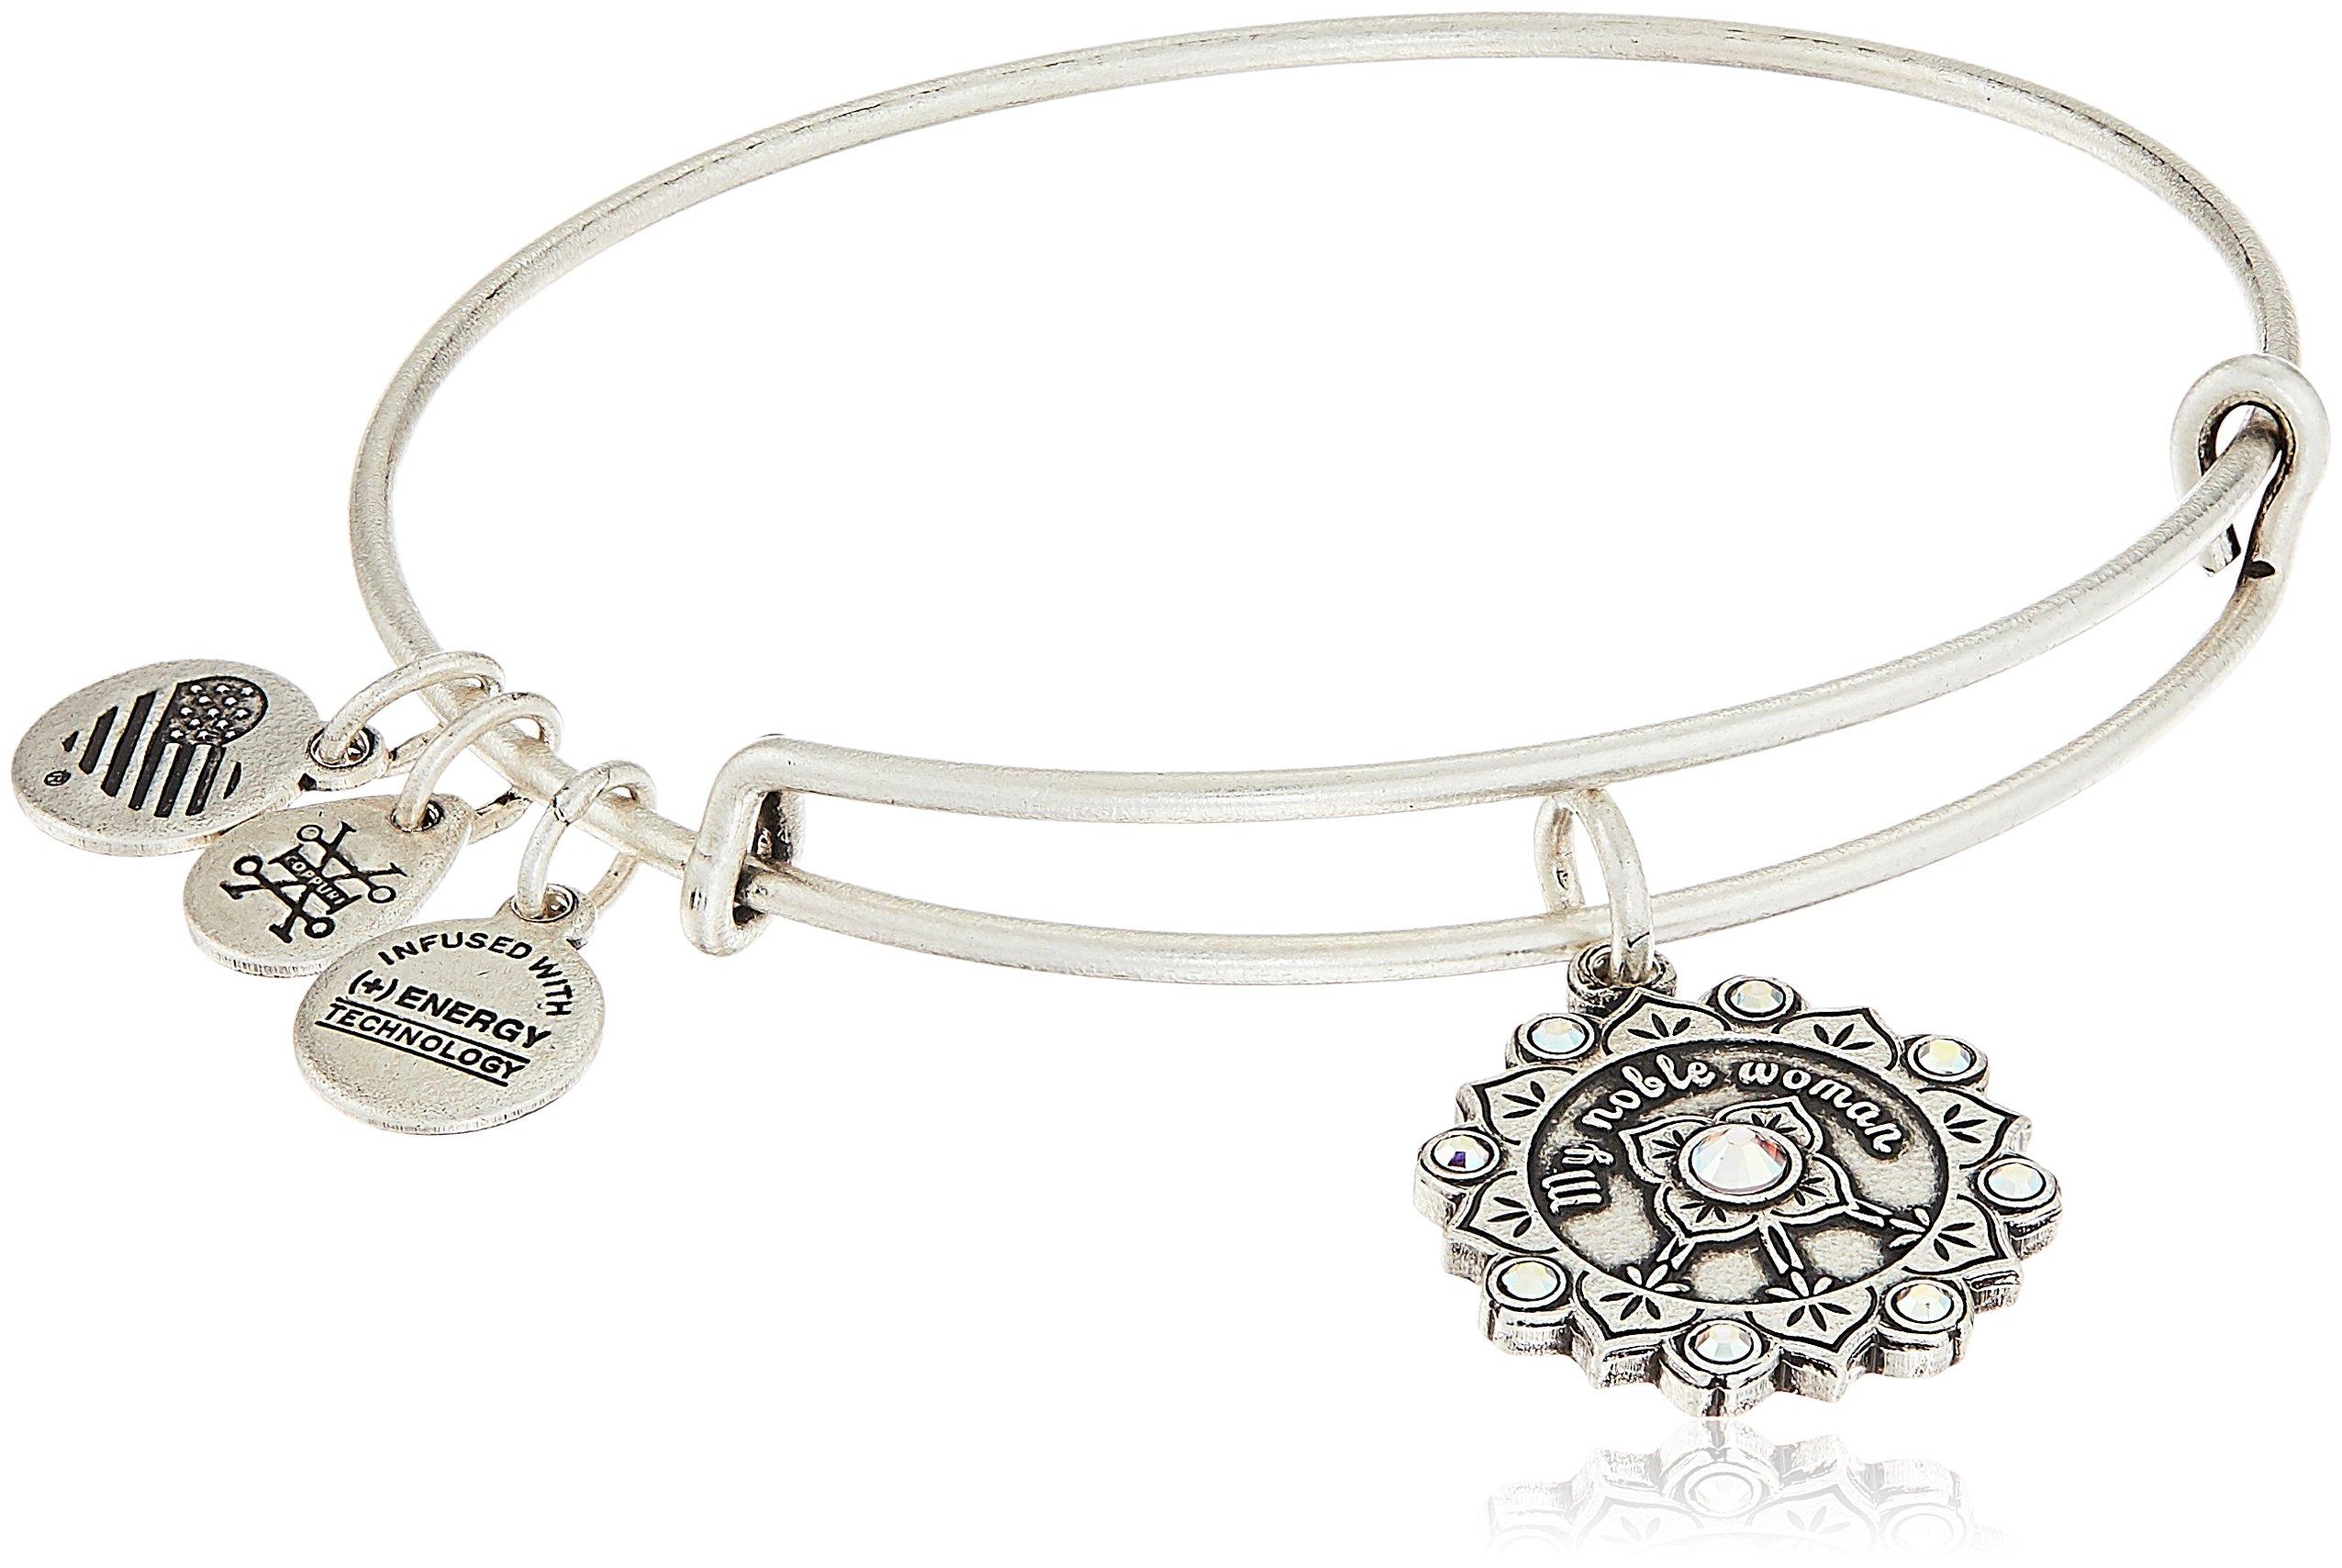 Alex and Ani Maid of Honor Rafaelian Silver Bangle Bracelet